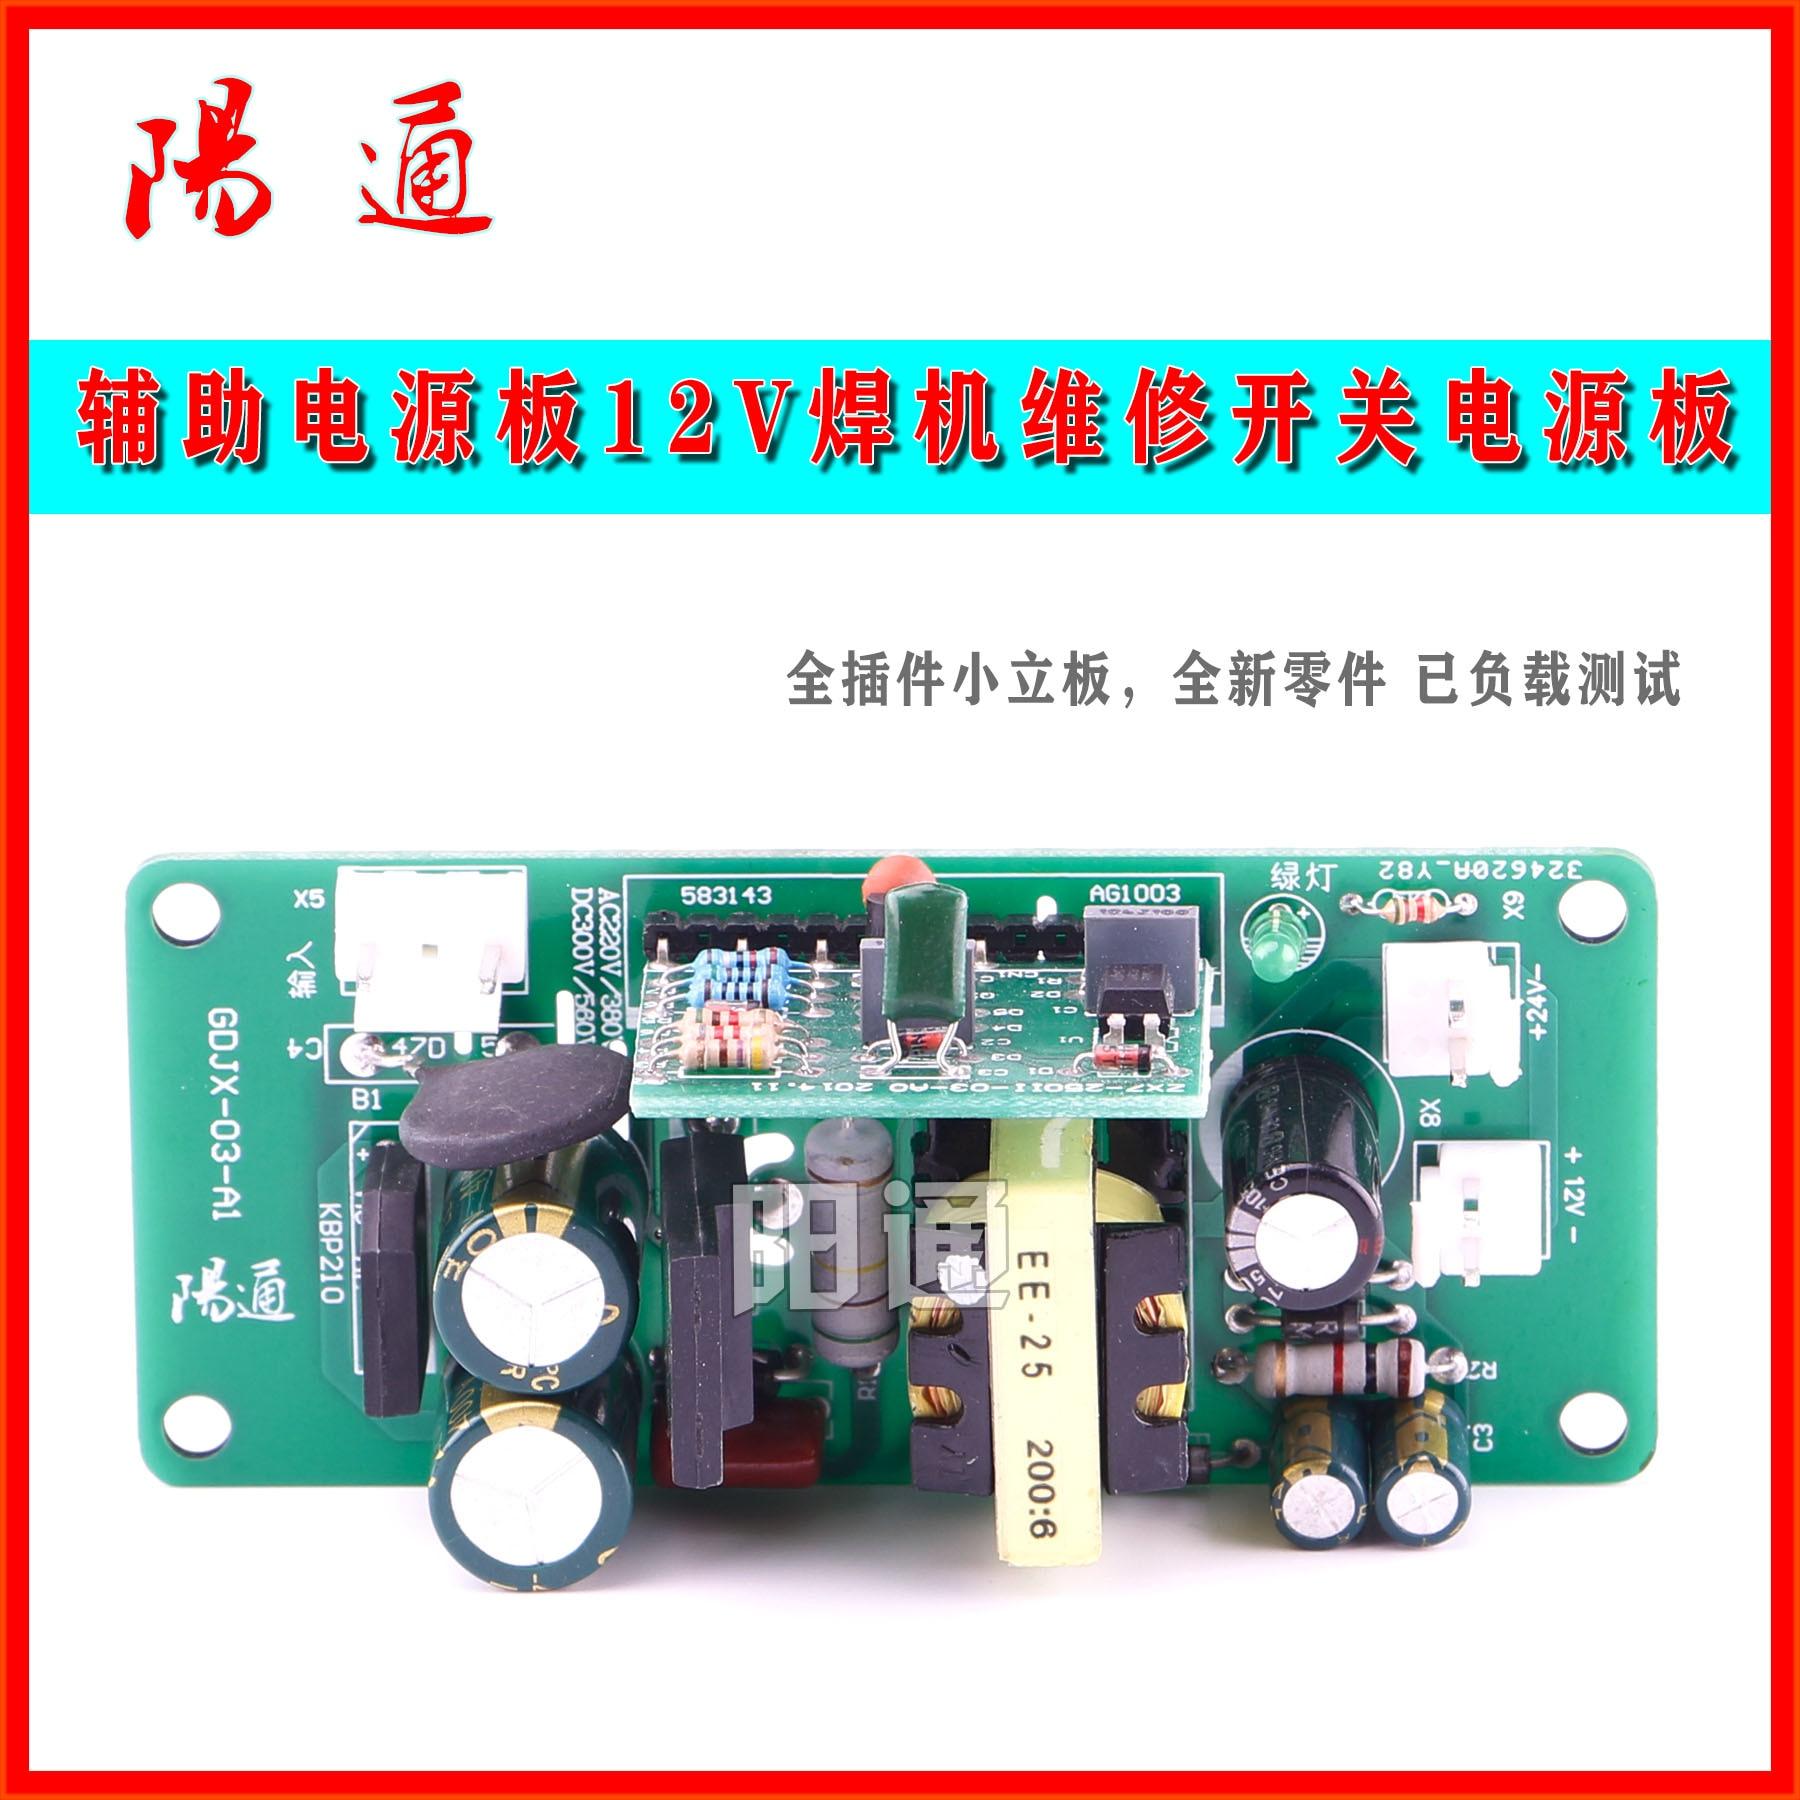 GDZX-03-A1 Inverter Welding Machine Auxiliary Power Board 12V/24V Power Supply 220/380V Input